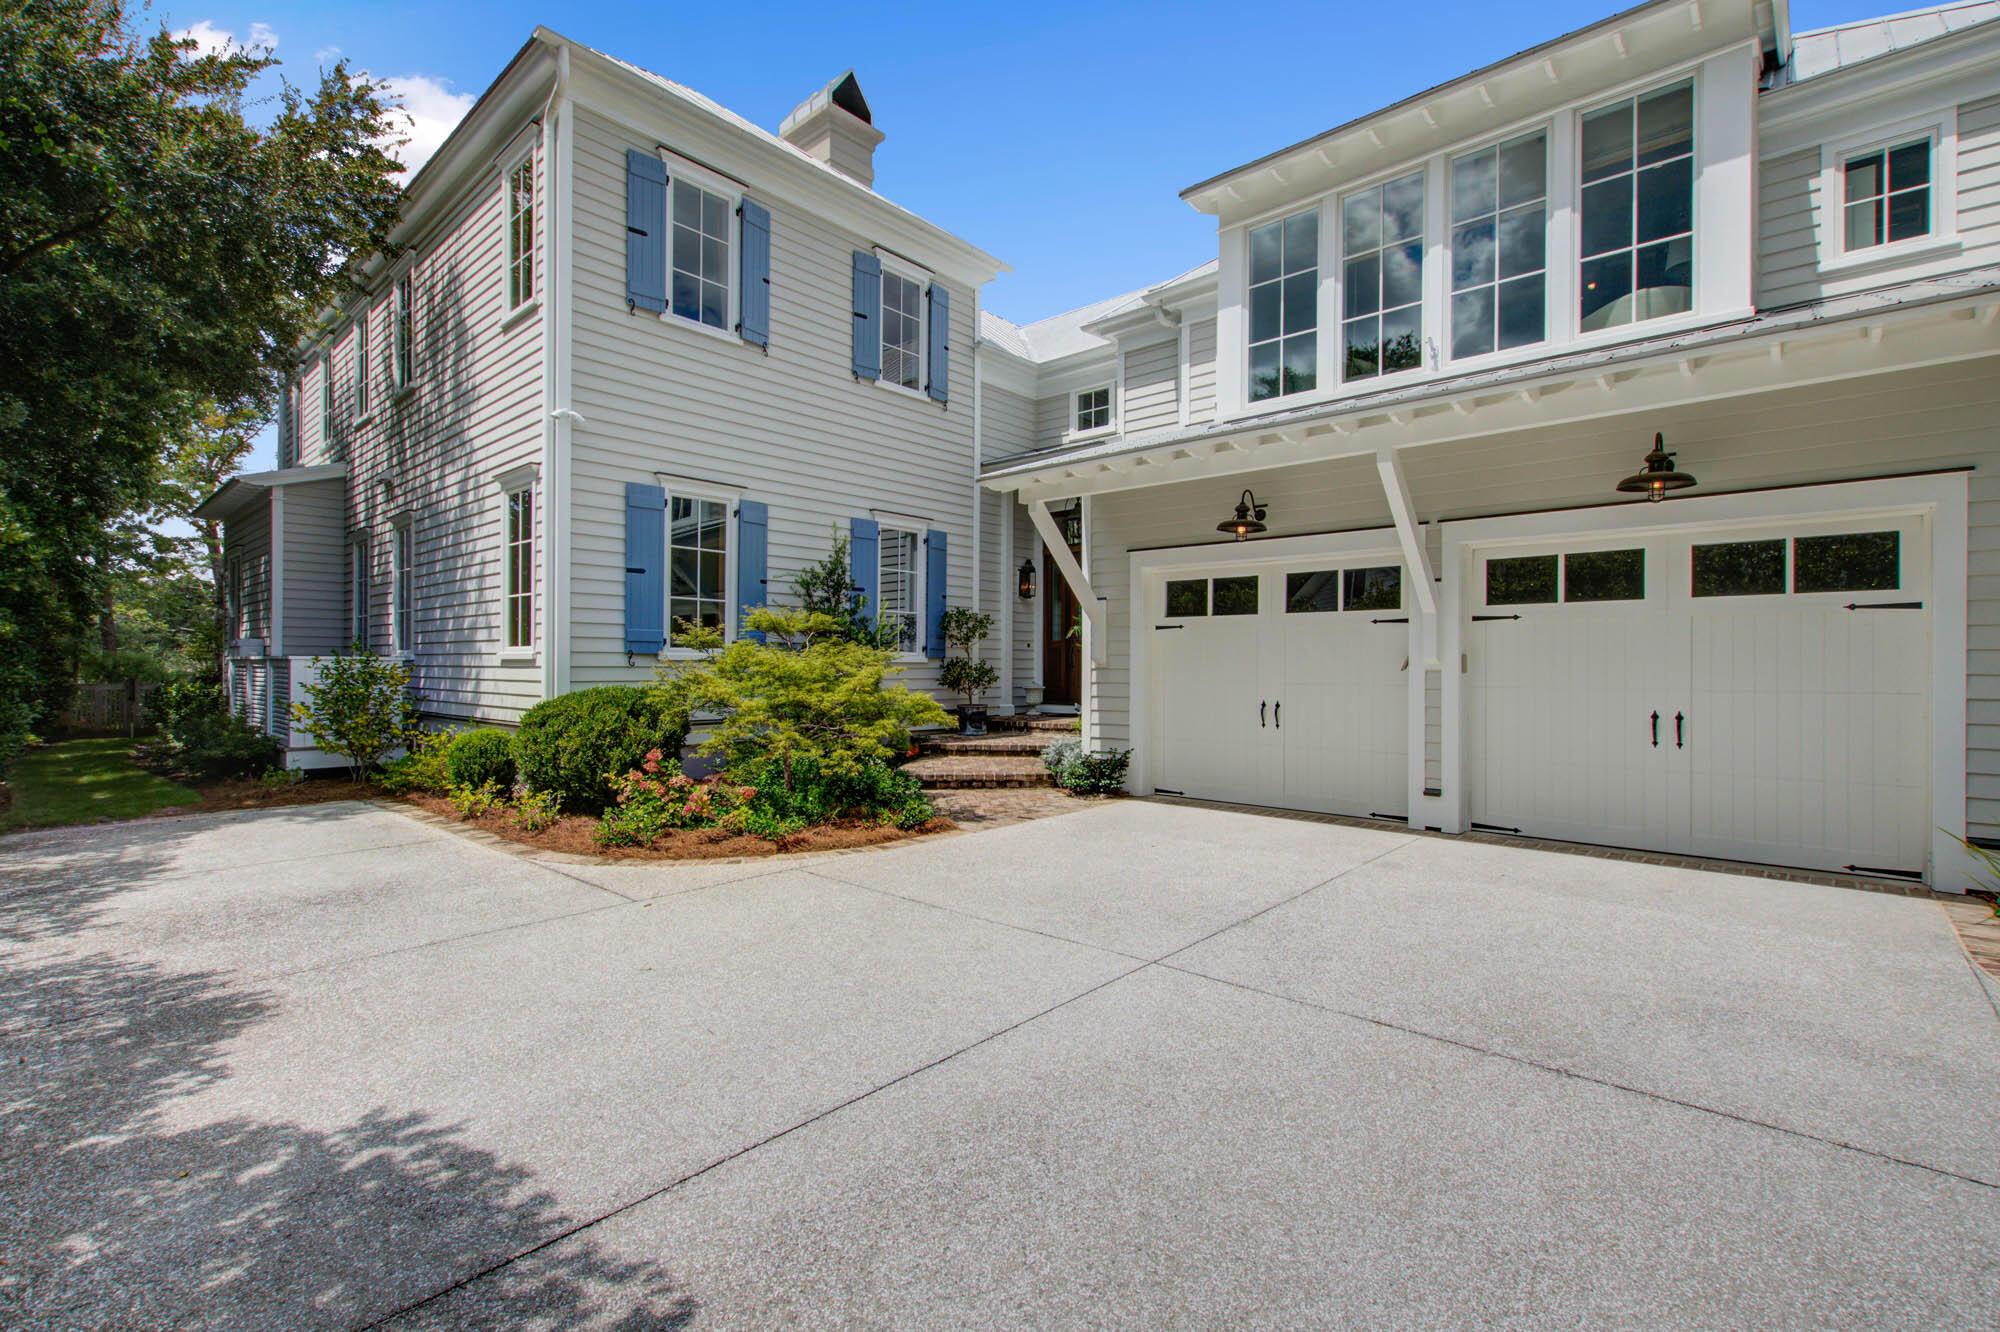 Molasses Creek Homes For Sale - 380 Overseer, Mount Pleasant, SC - 20